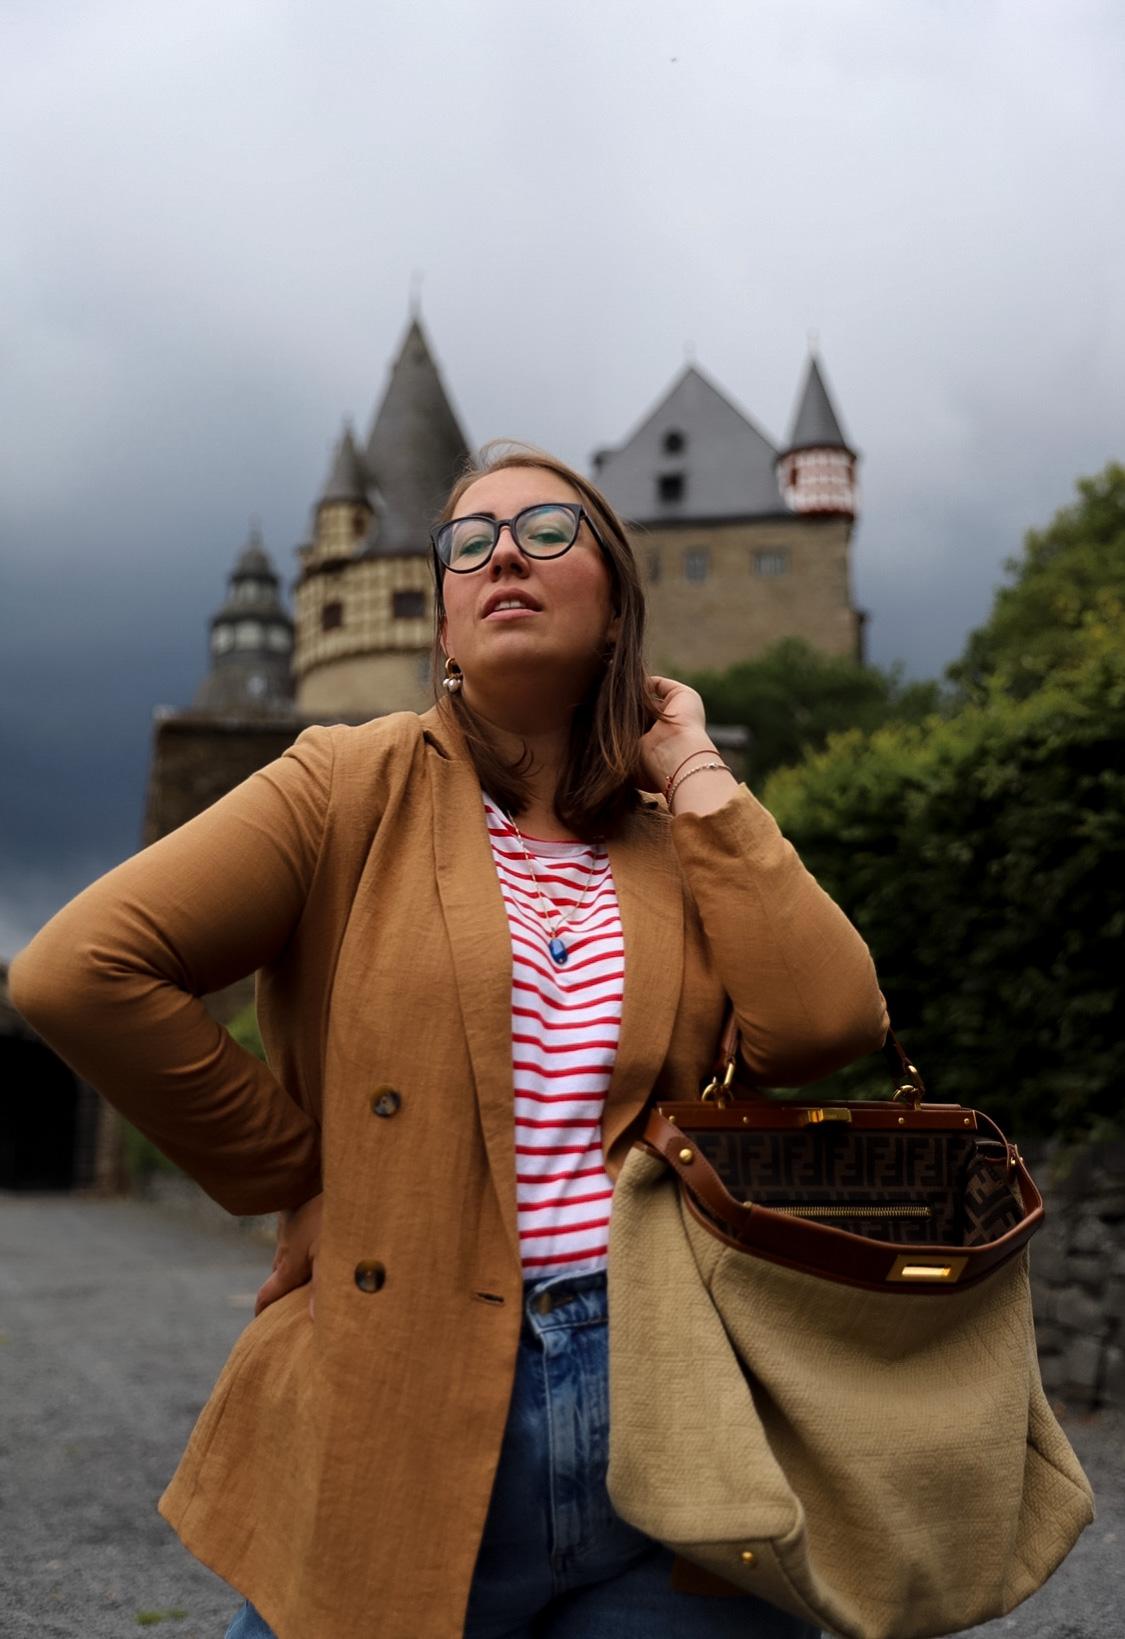 Parisienne-Style-French-Chic-Outfit-Tipps-Breton-Shirt-Streifenshirt-Ringelshirt-Momjeans-Vintage-Fendi-Peekaboo-Leinen-Bag-Leinenblazer-Mom-Jeans_Miss-Suzie-Loves